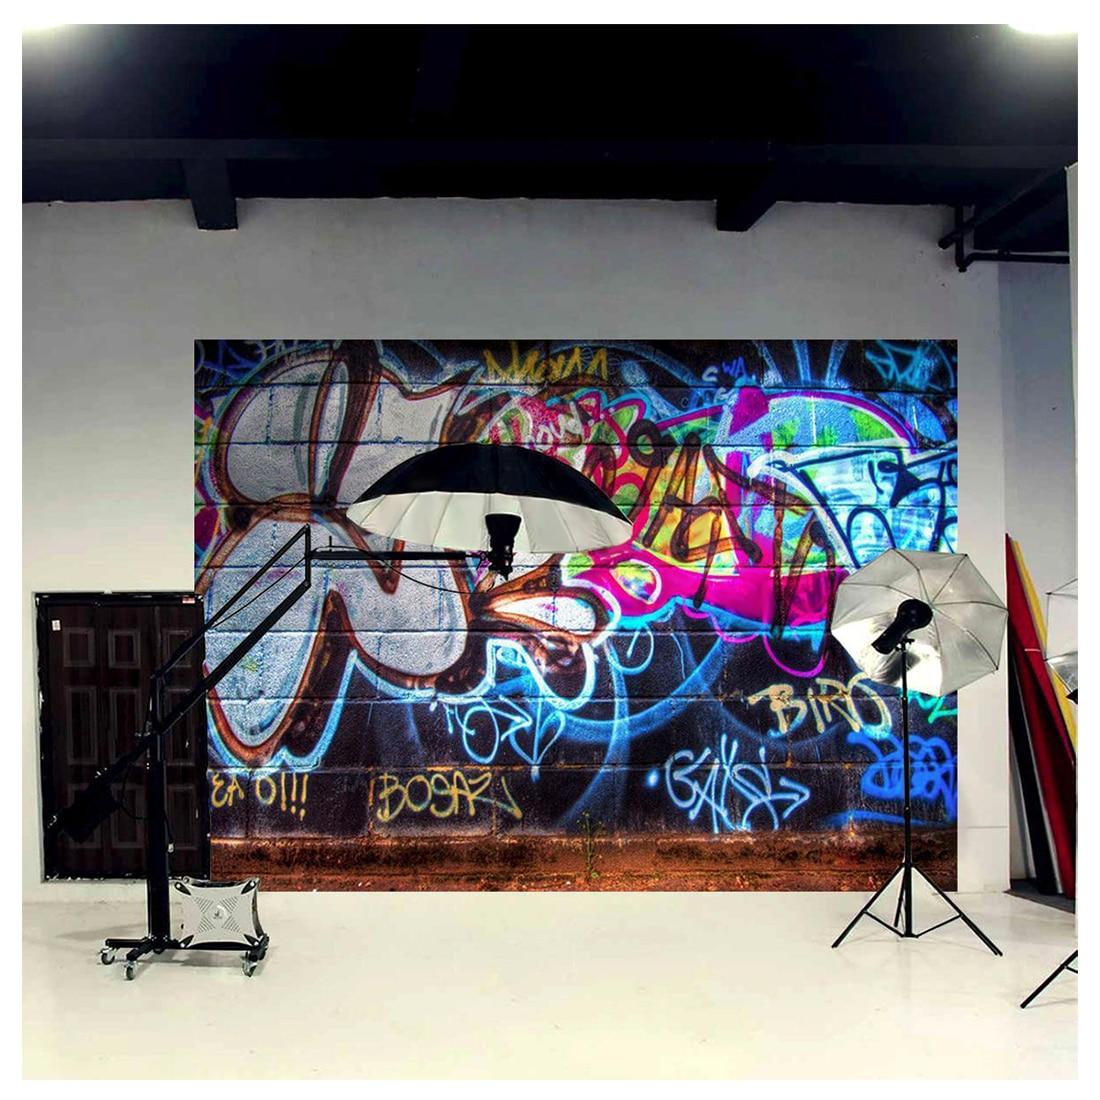 Graffiti wall vinyl - Top Deals 3x5ft Vinyl Photography Backdrop Wall Photo Background Graffiti China